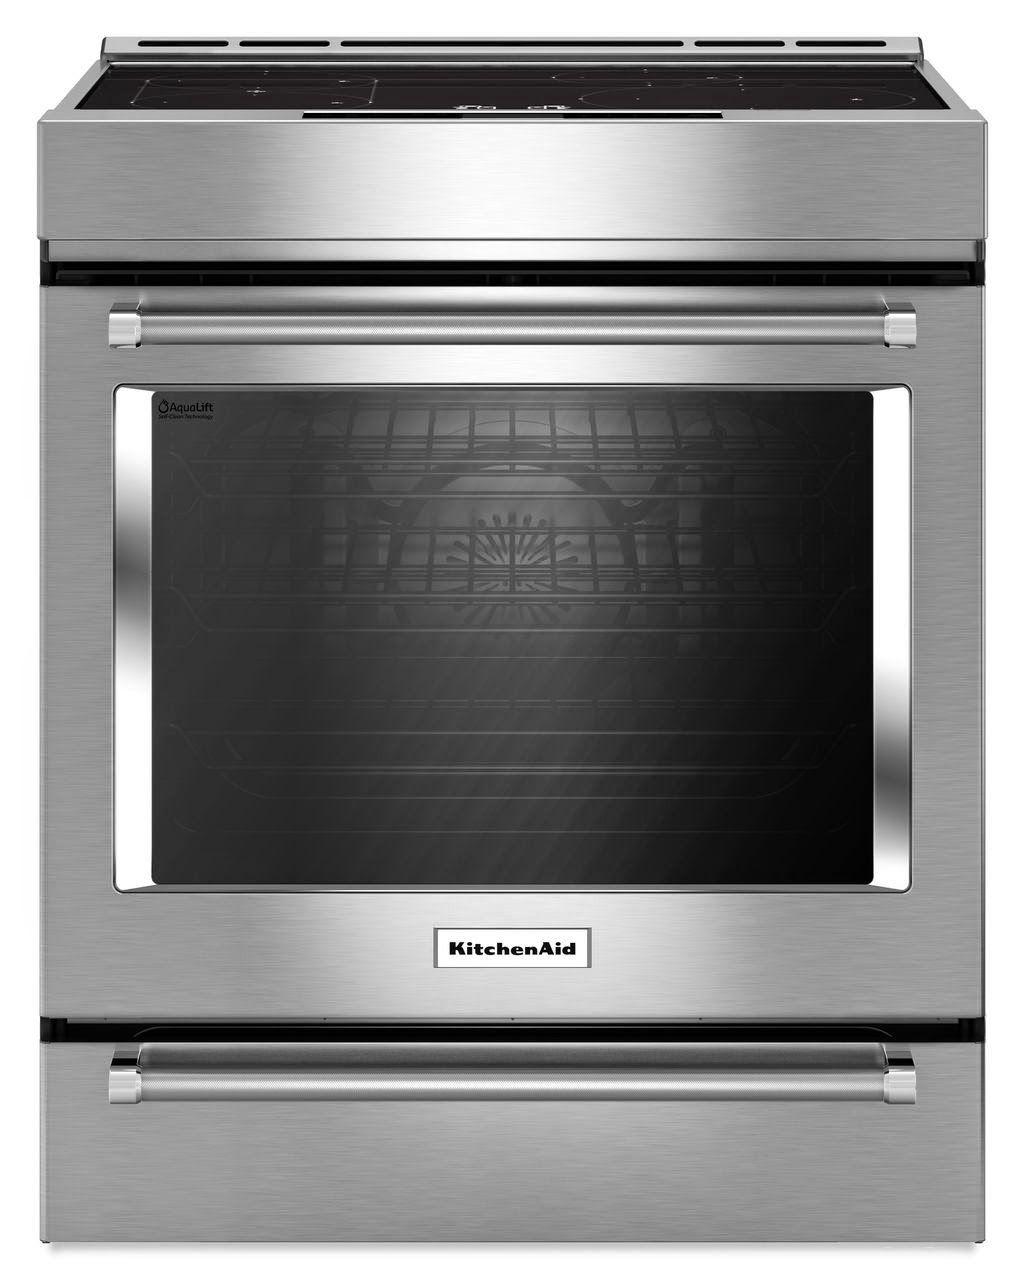 kitchenaid induction range